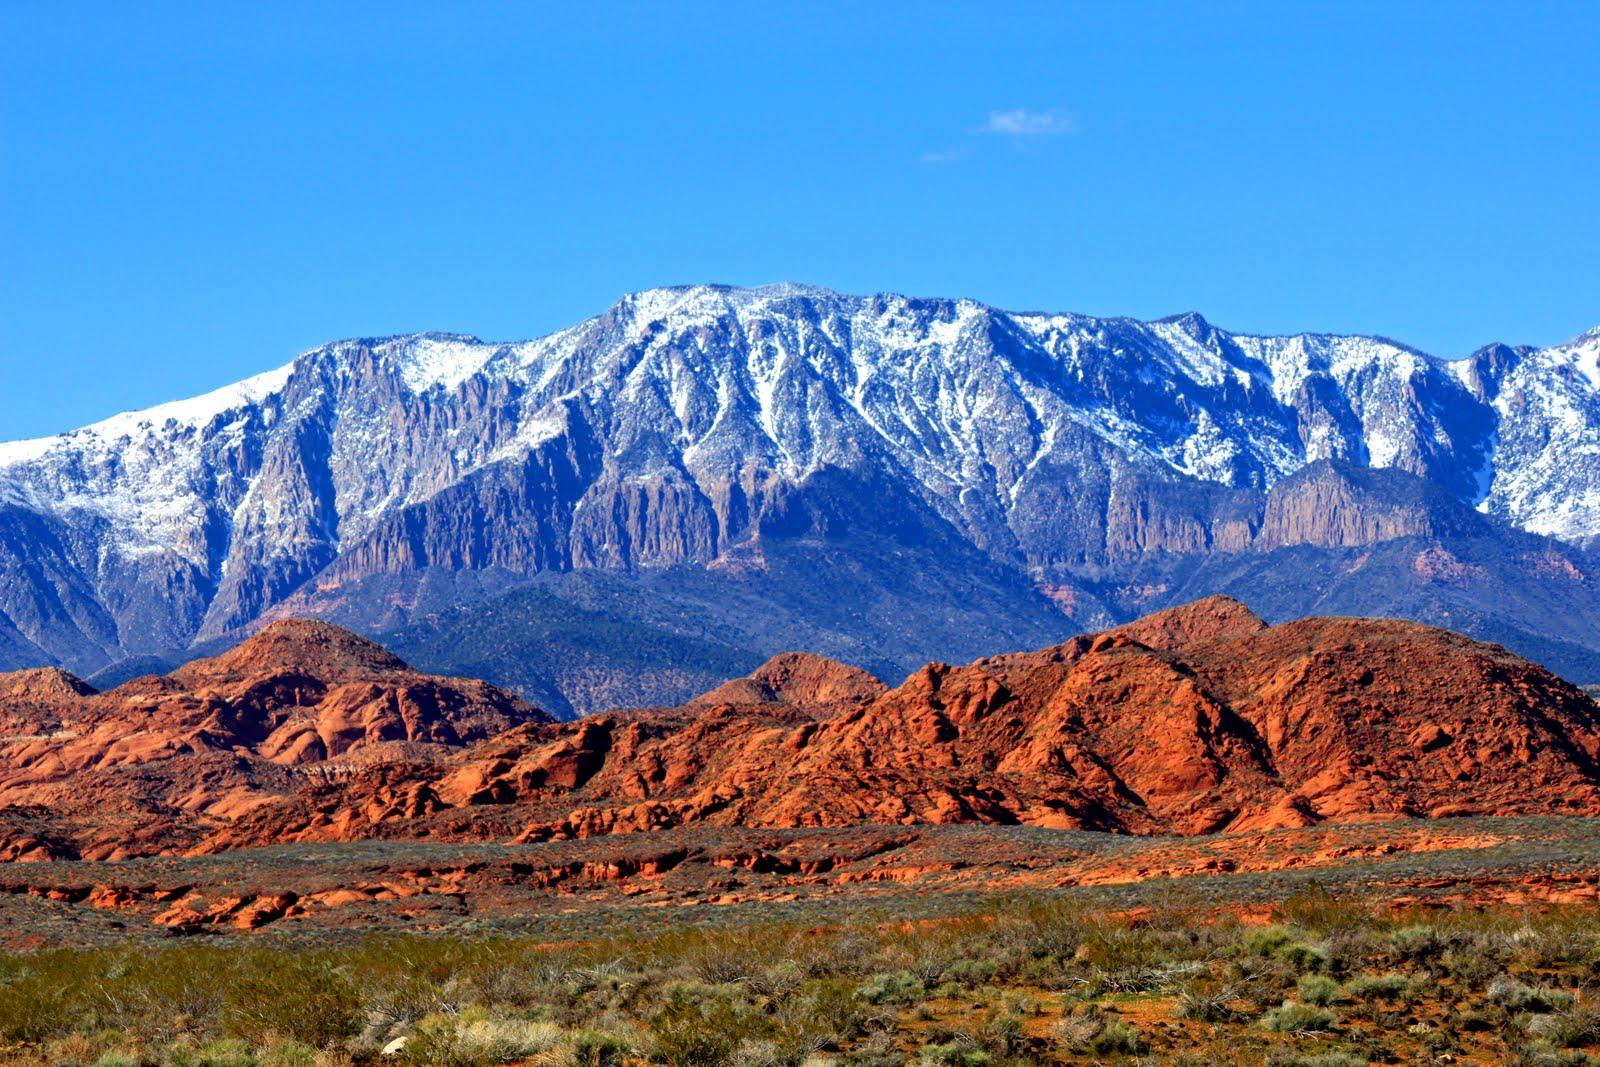 KVW PHOTOGRAPHY: Utah Landscapes